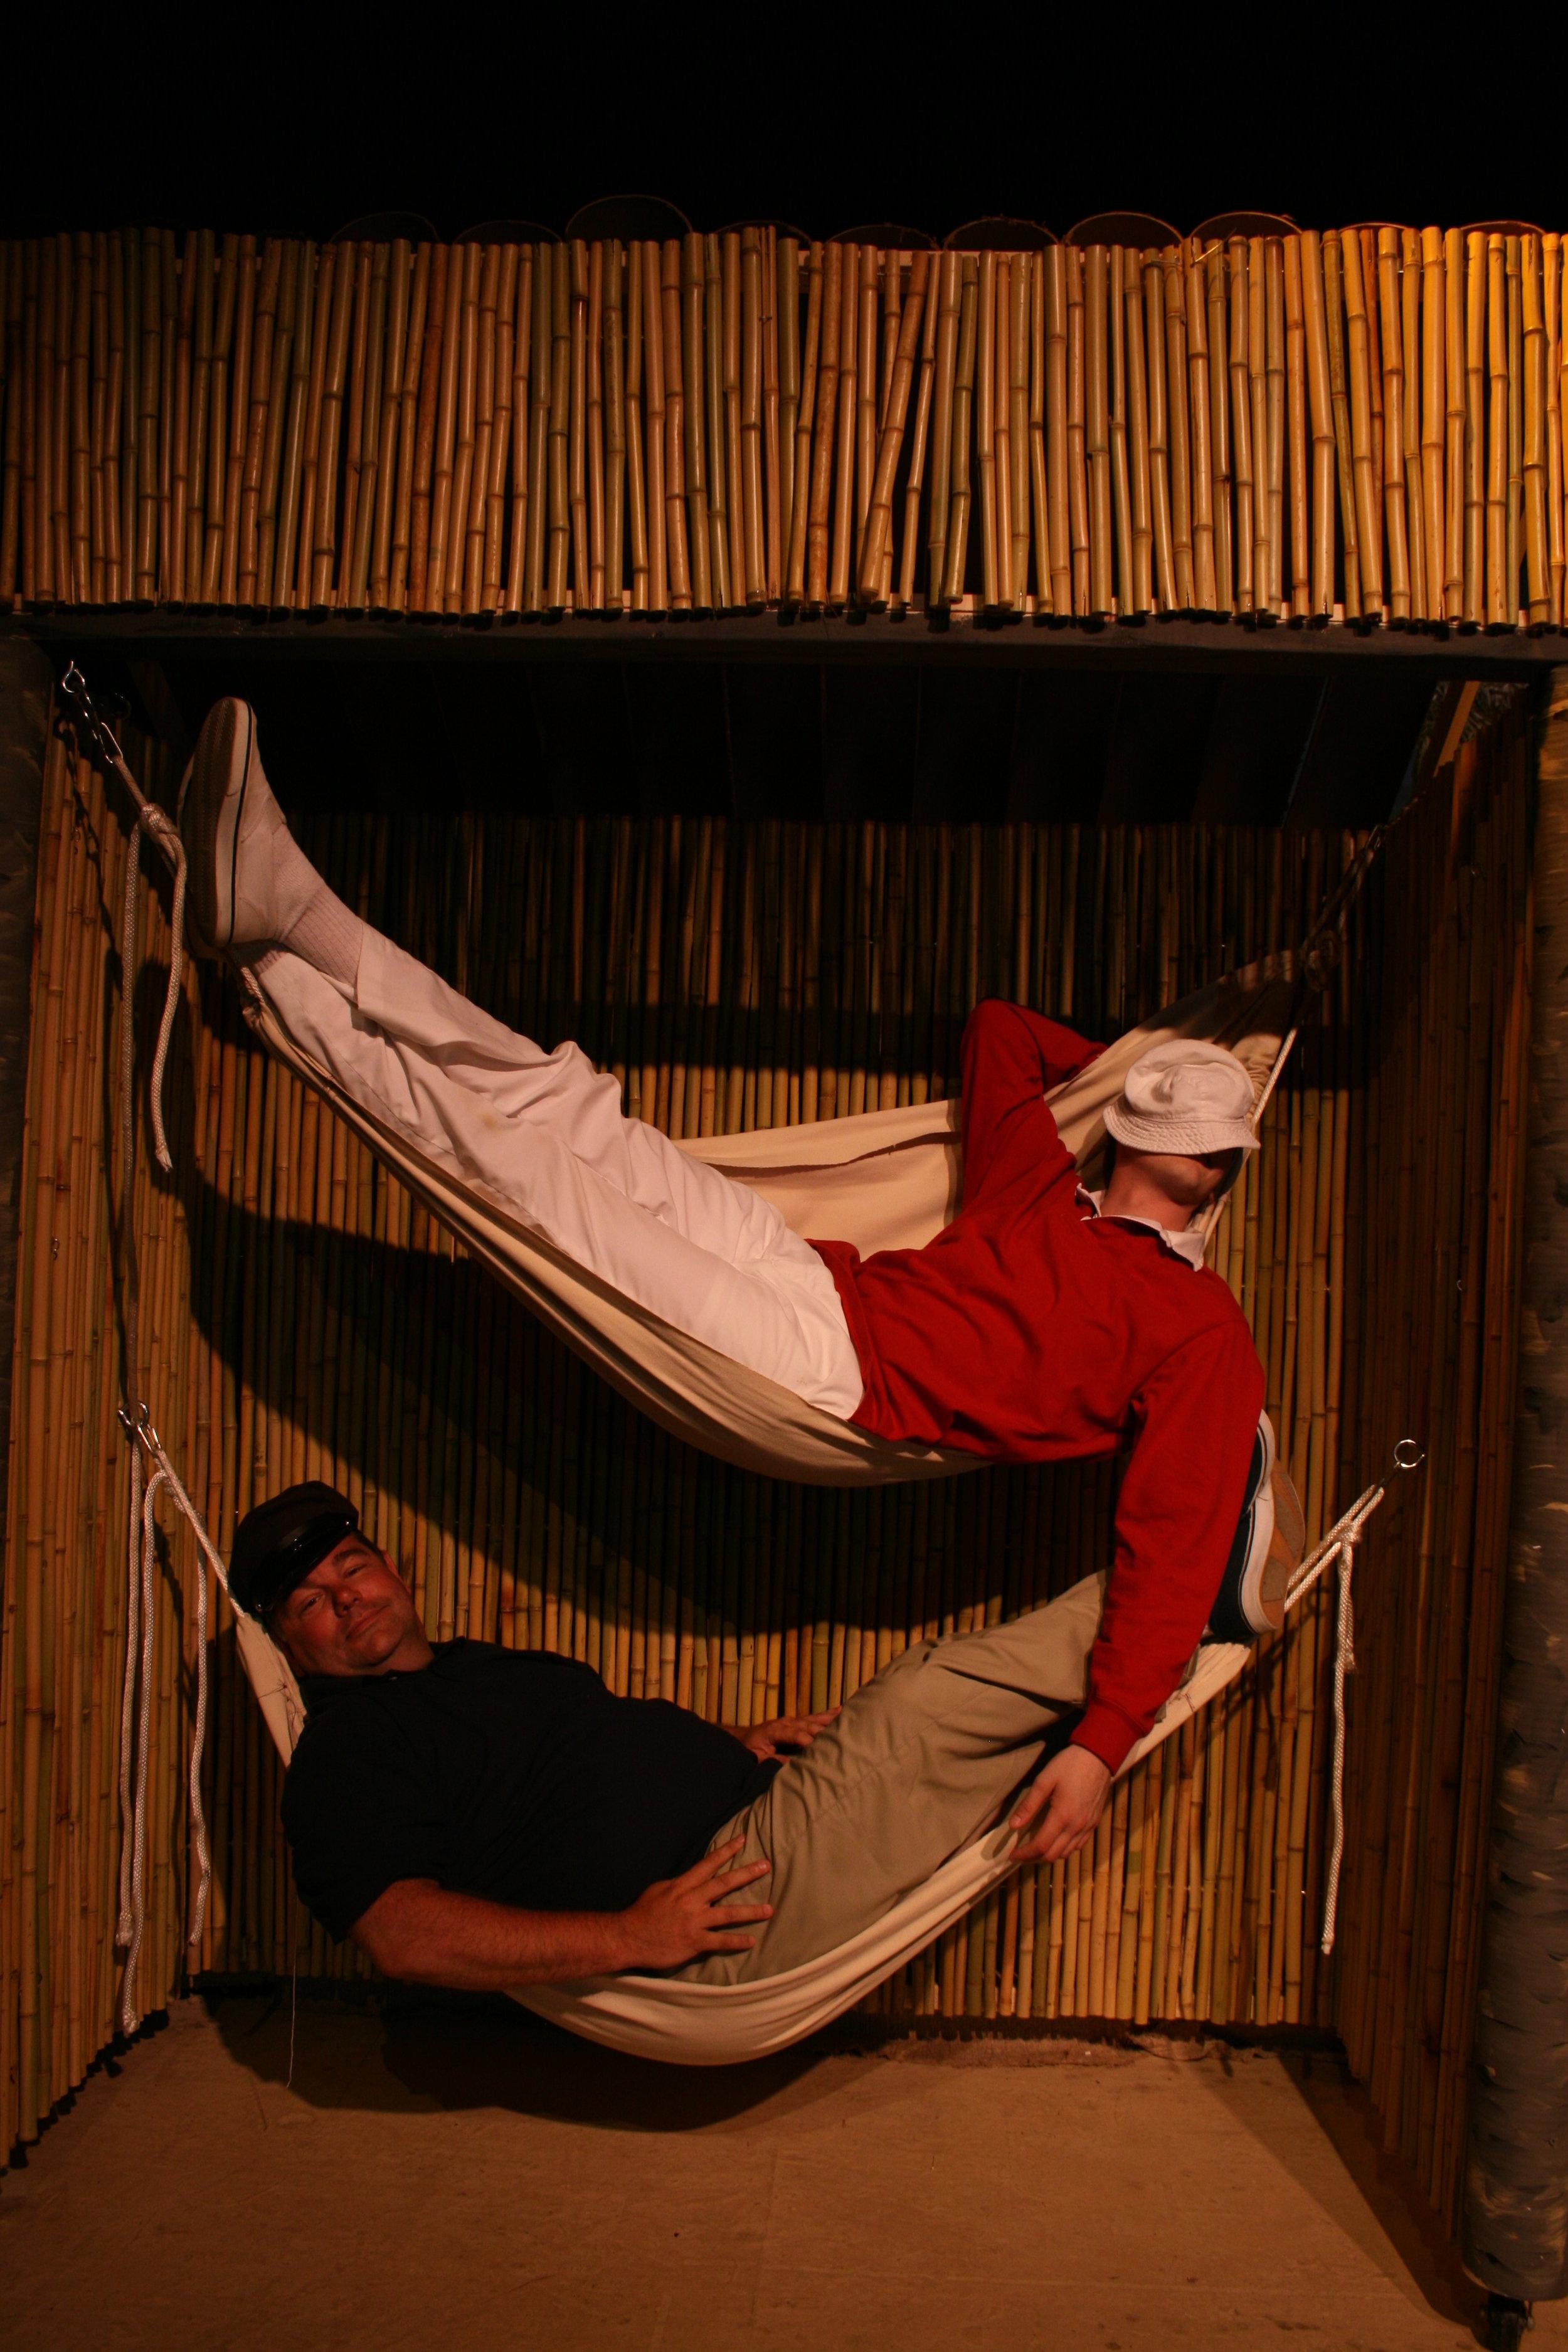 Production of Gilligan's Island 2008. Top: Luke Ellis as Gilligan, Bottom: Jeff Johnson as The Skipper